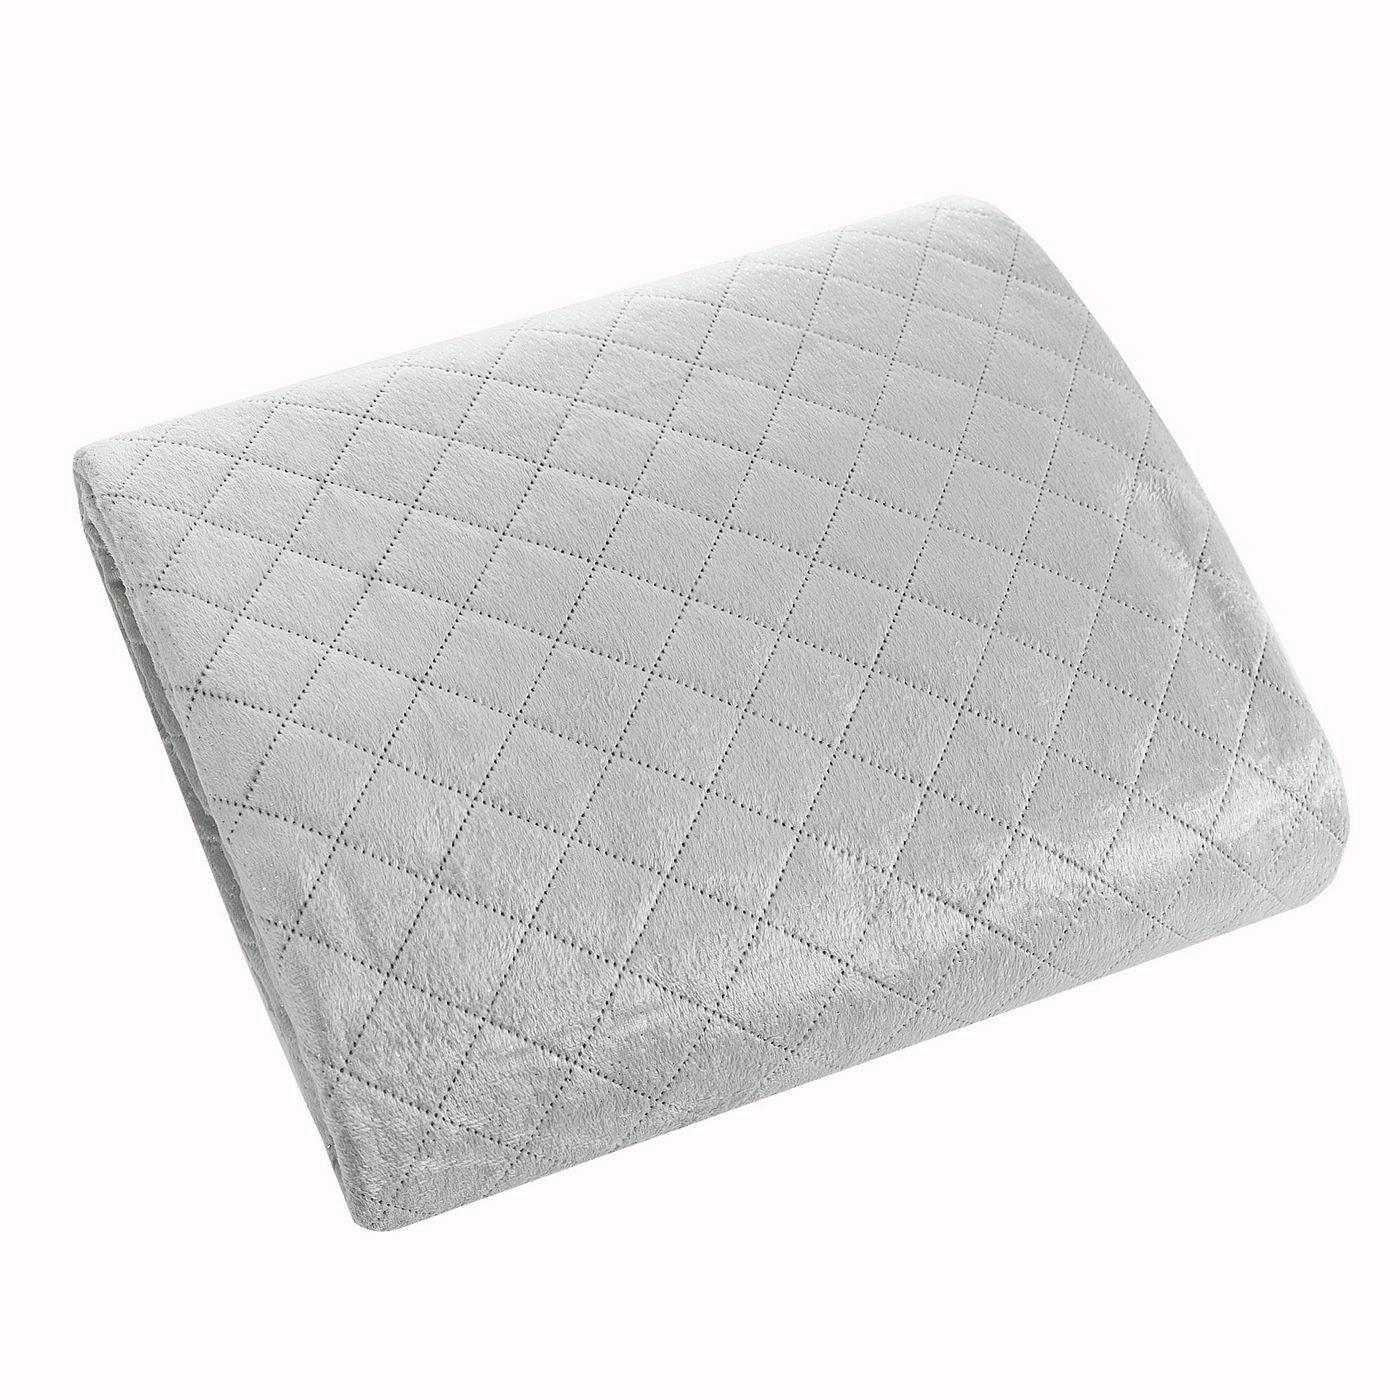 Narzuta na łóżko pikowana hotpress 170x210 cm srebrna